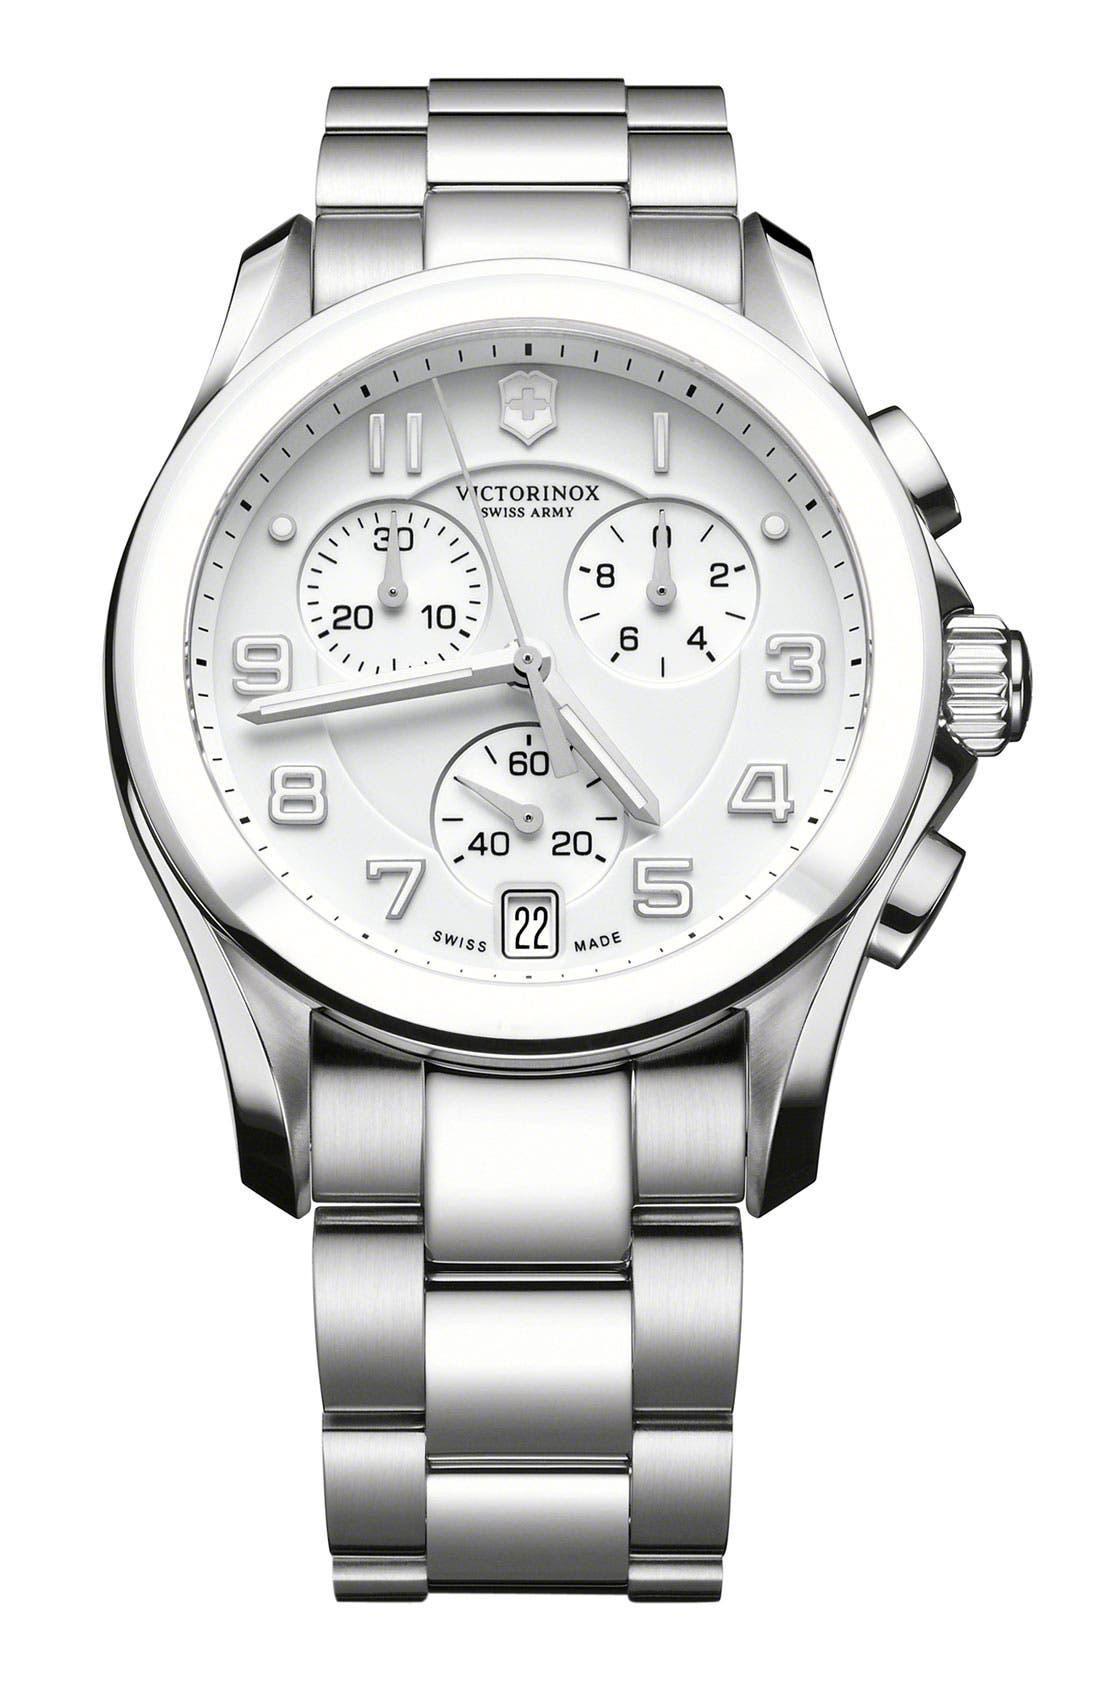 Alternate Image 1 Selected - Victorinox Swiss Army® 'Chrono Classic' Watch with Ceramic Bezel